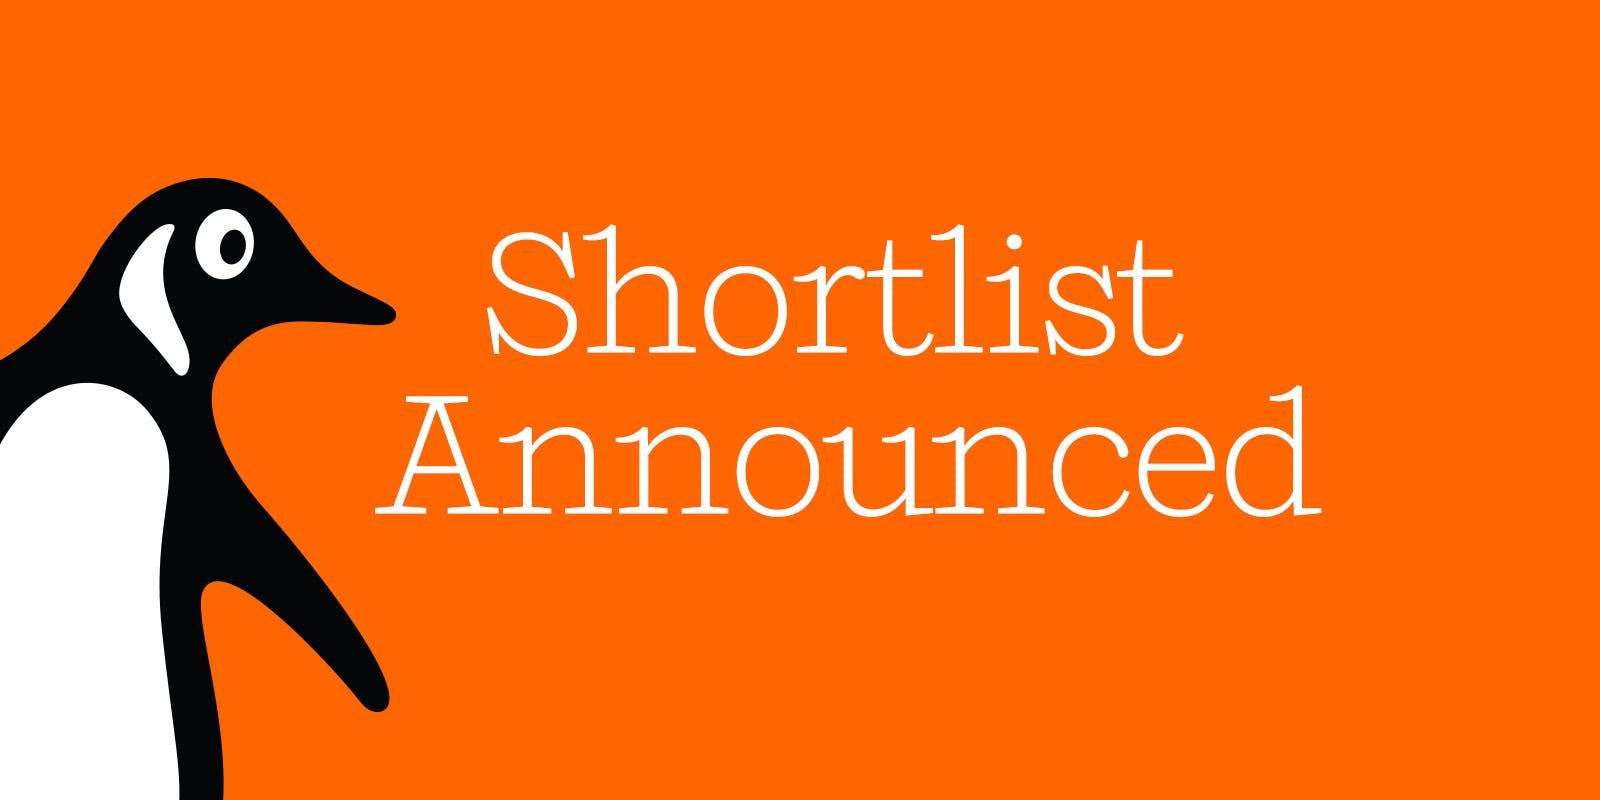 Penguin Literary Prize shortlist